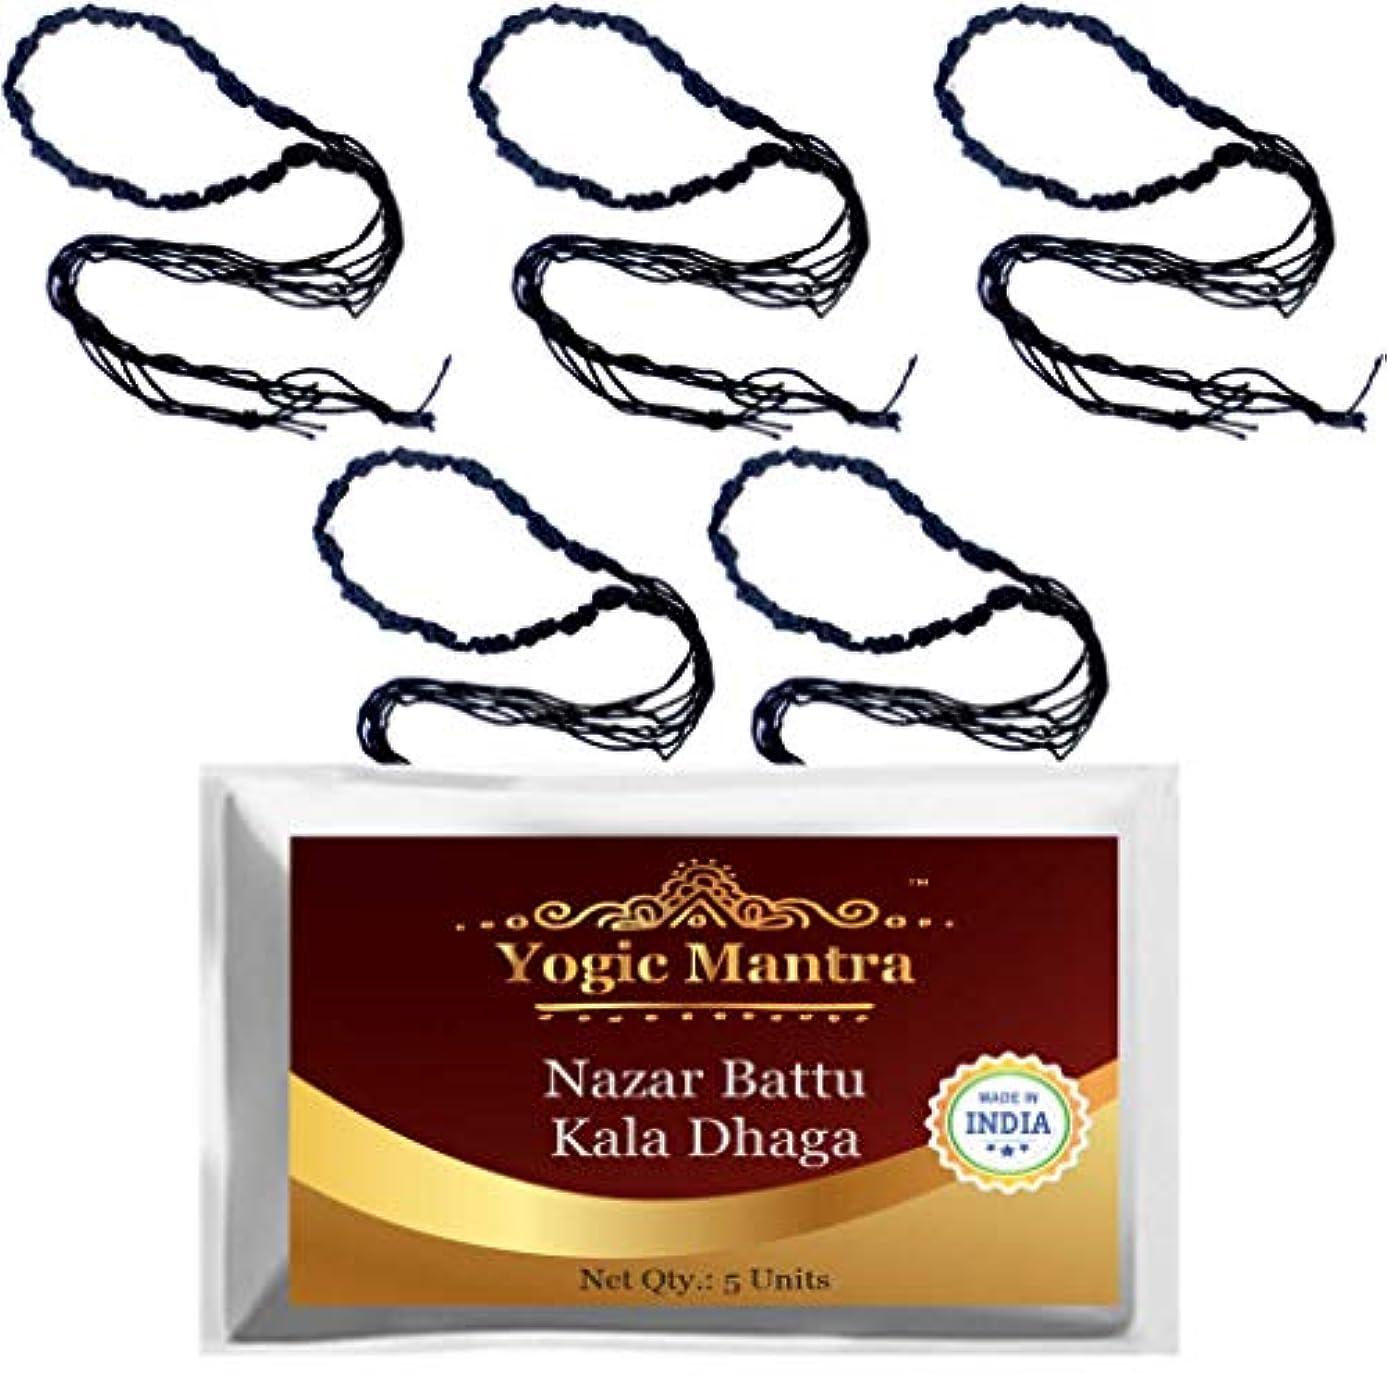 Yogic Mantra Nazar Battu Kala Dhaga (5 Handmade Black Thread Kalava Raksha Sutra - Made from 4 Silk Strings Each) Energized Sacred Holy Thread Evil Eye Protection Anklets for Men, Women & Children